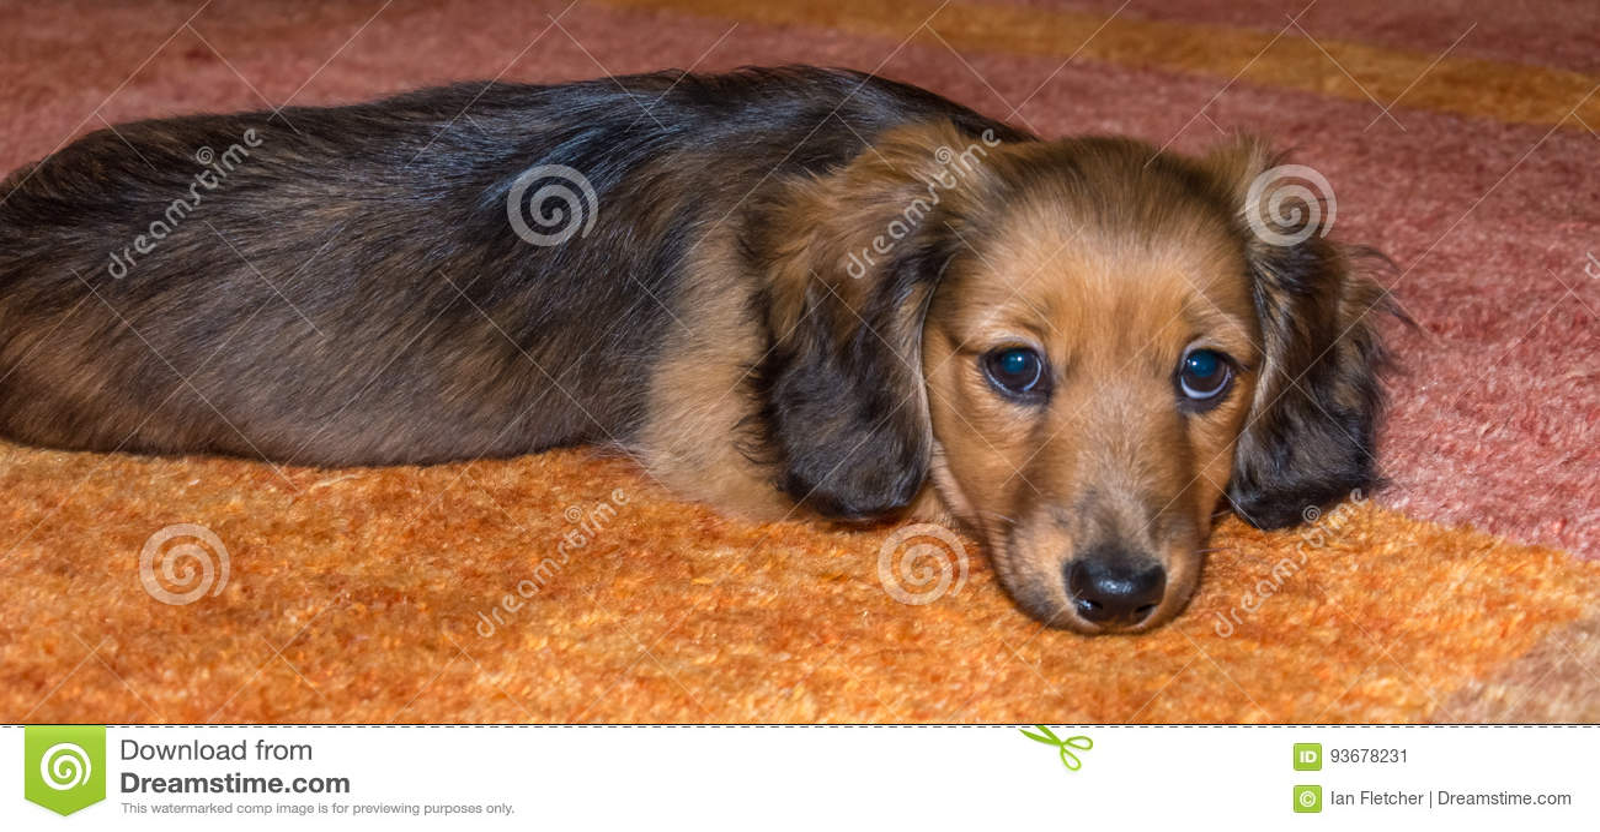 Miniature Long Haired Dachshund Stock Image Image Of Carpet Eyes 93678231